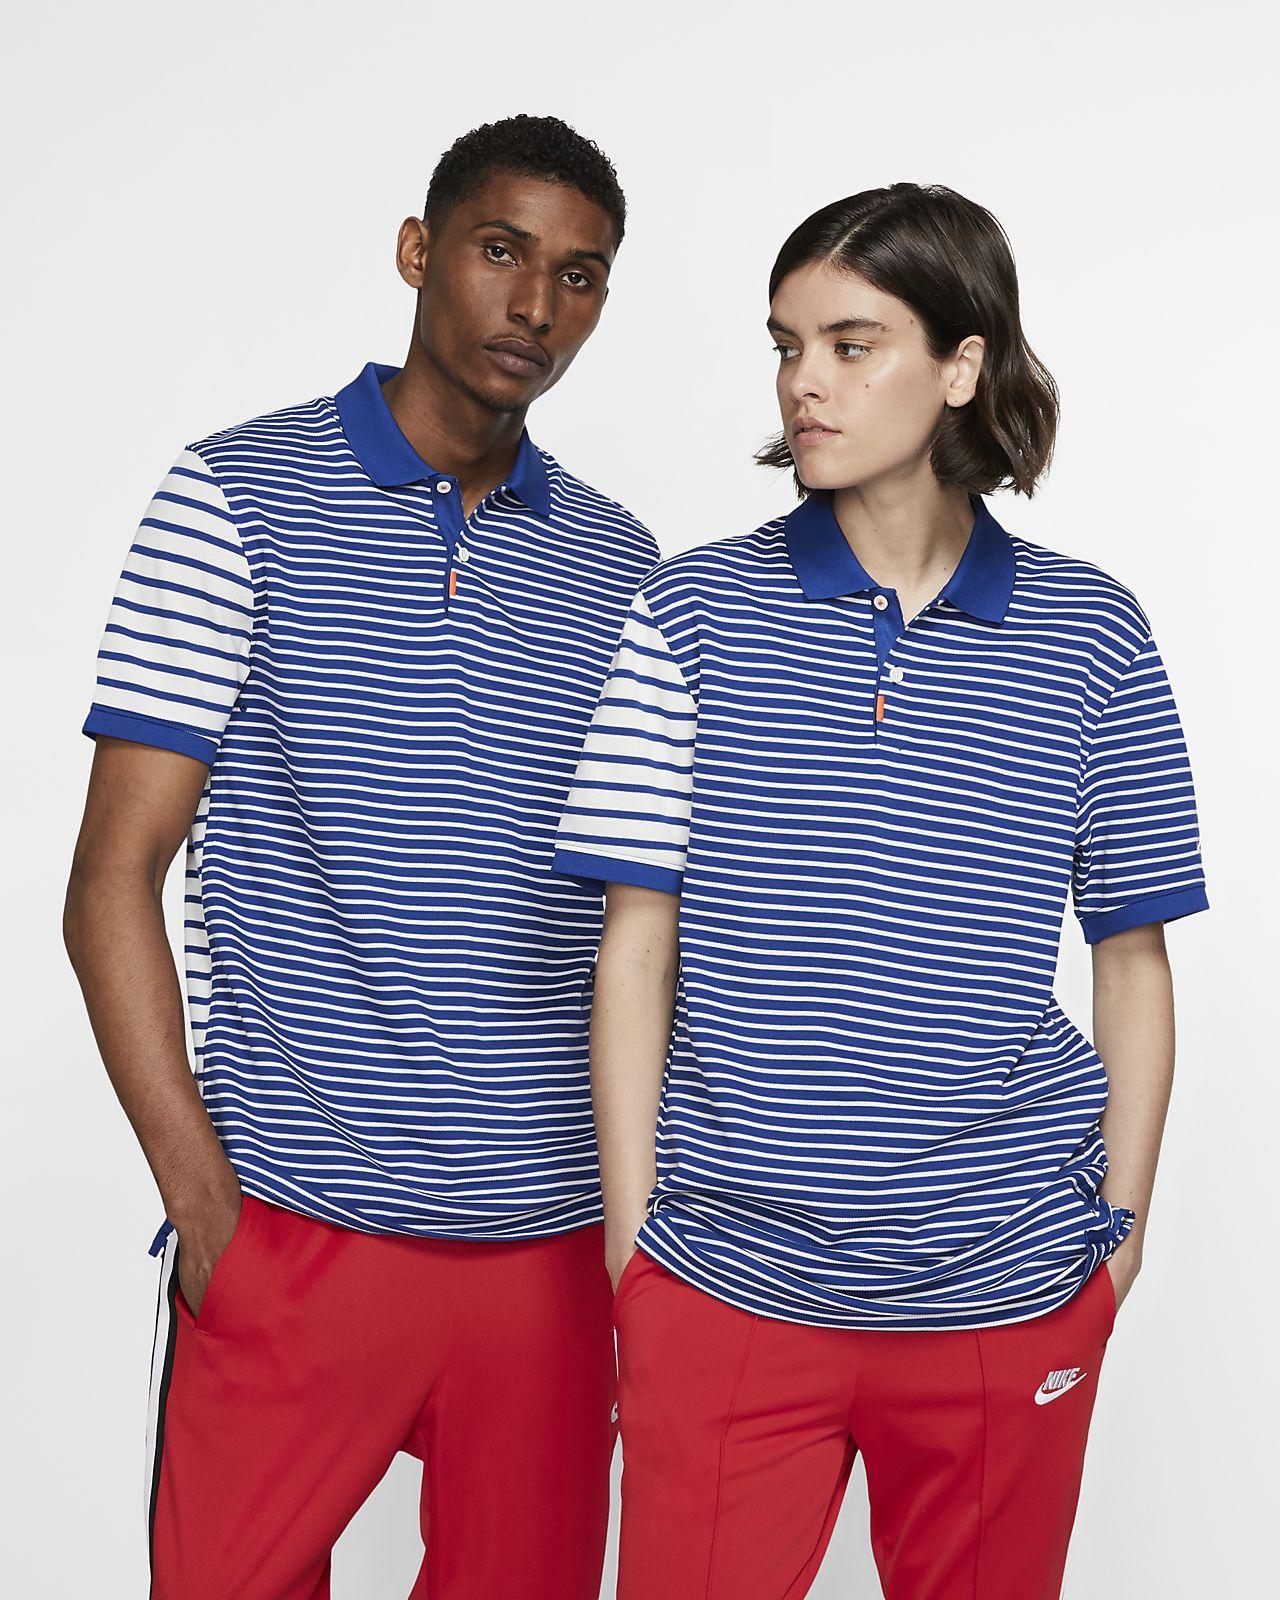 The Nike Polo Unisex Striped Polo